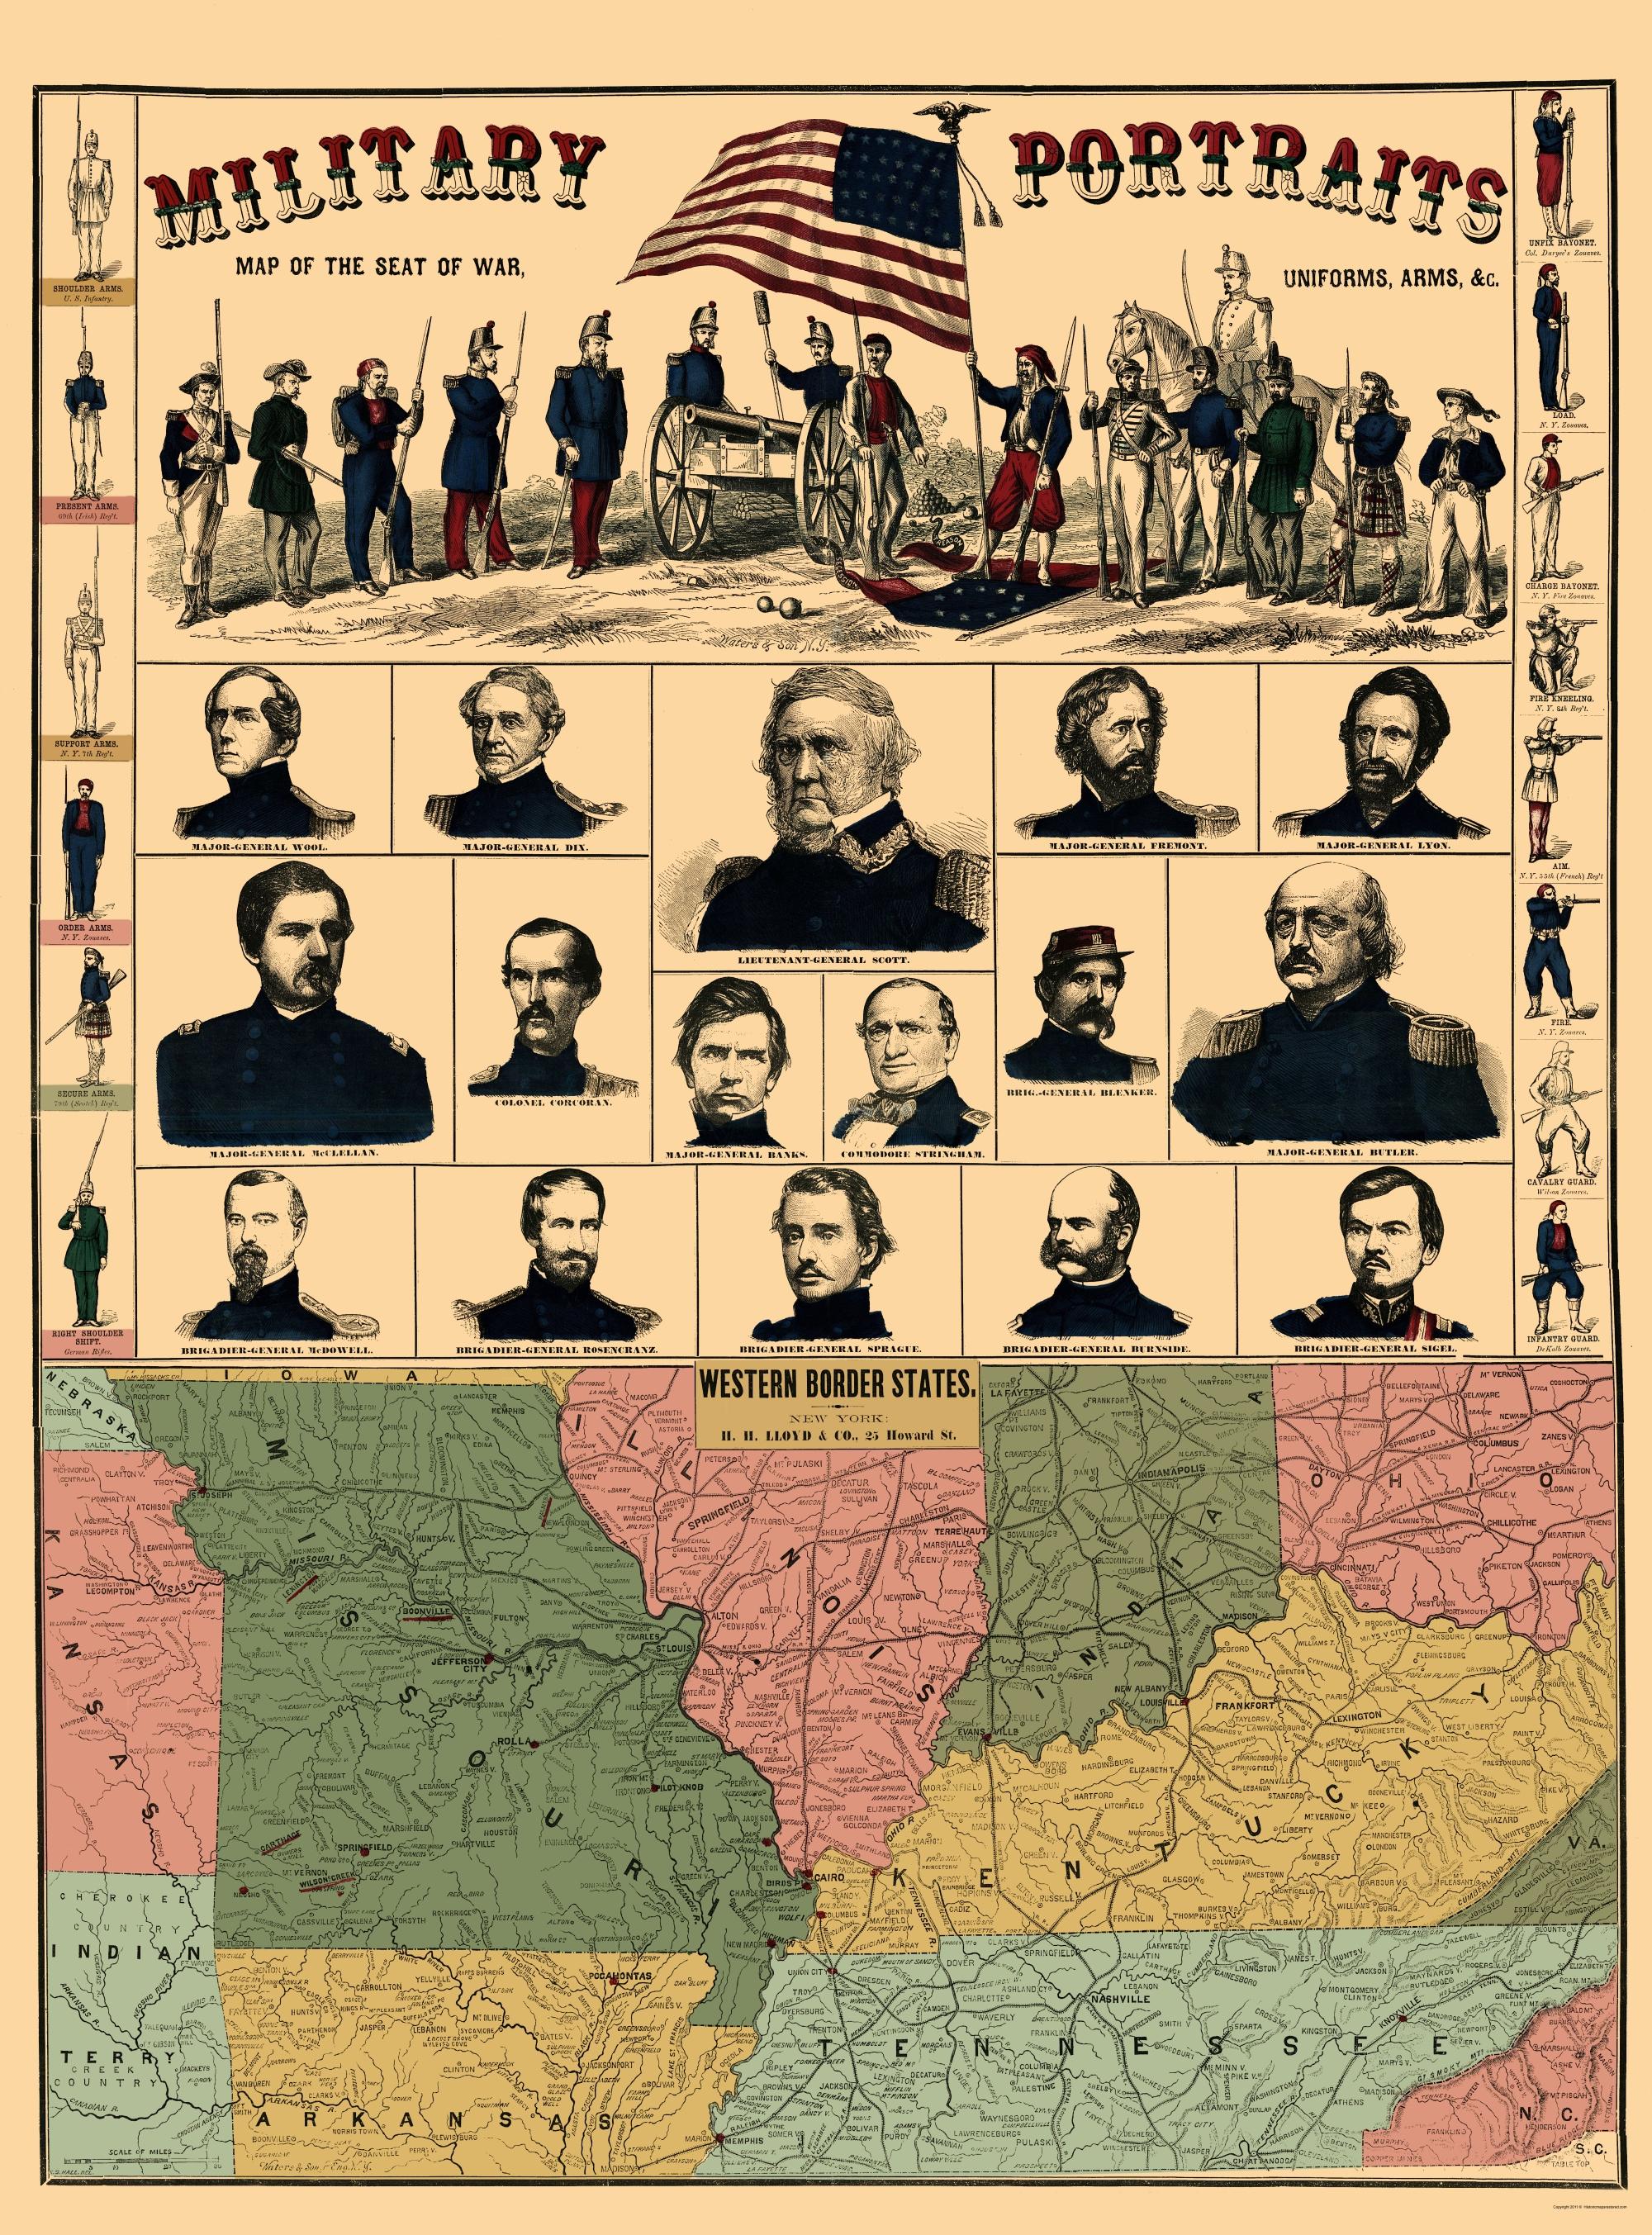 Civil War Map Border States Military Portraits 1861